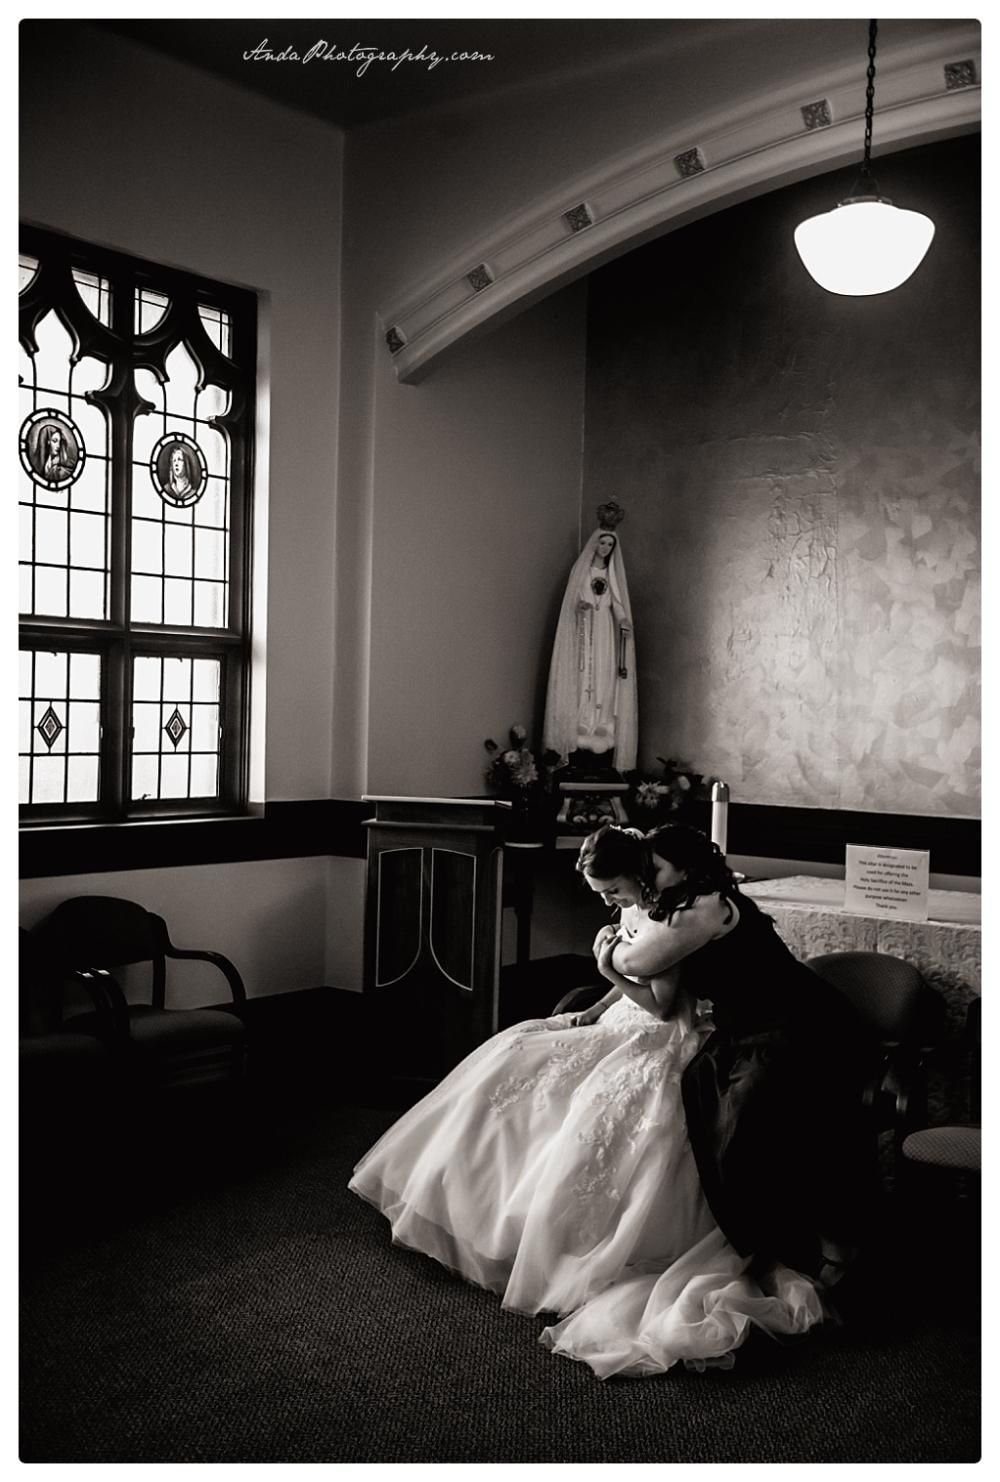 Anda Photography Bellingham wedding photographer Bellingham Yacht Club Wedding lifestyle wedding photographer Seattle Wedding Photographer_0017